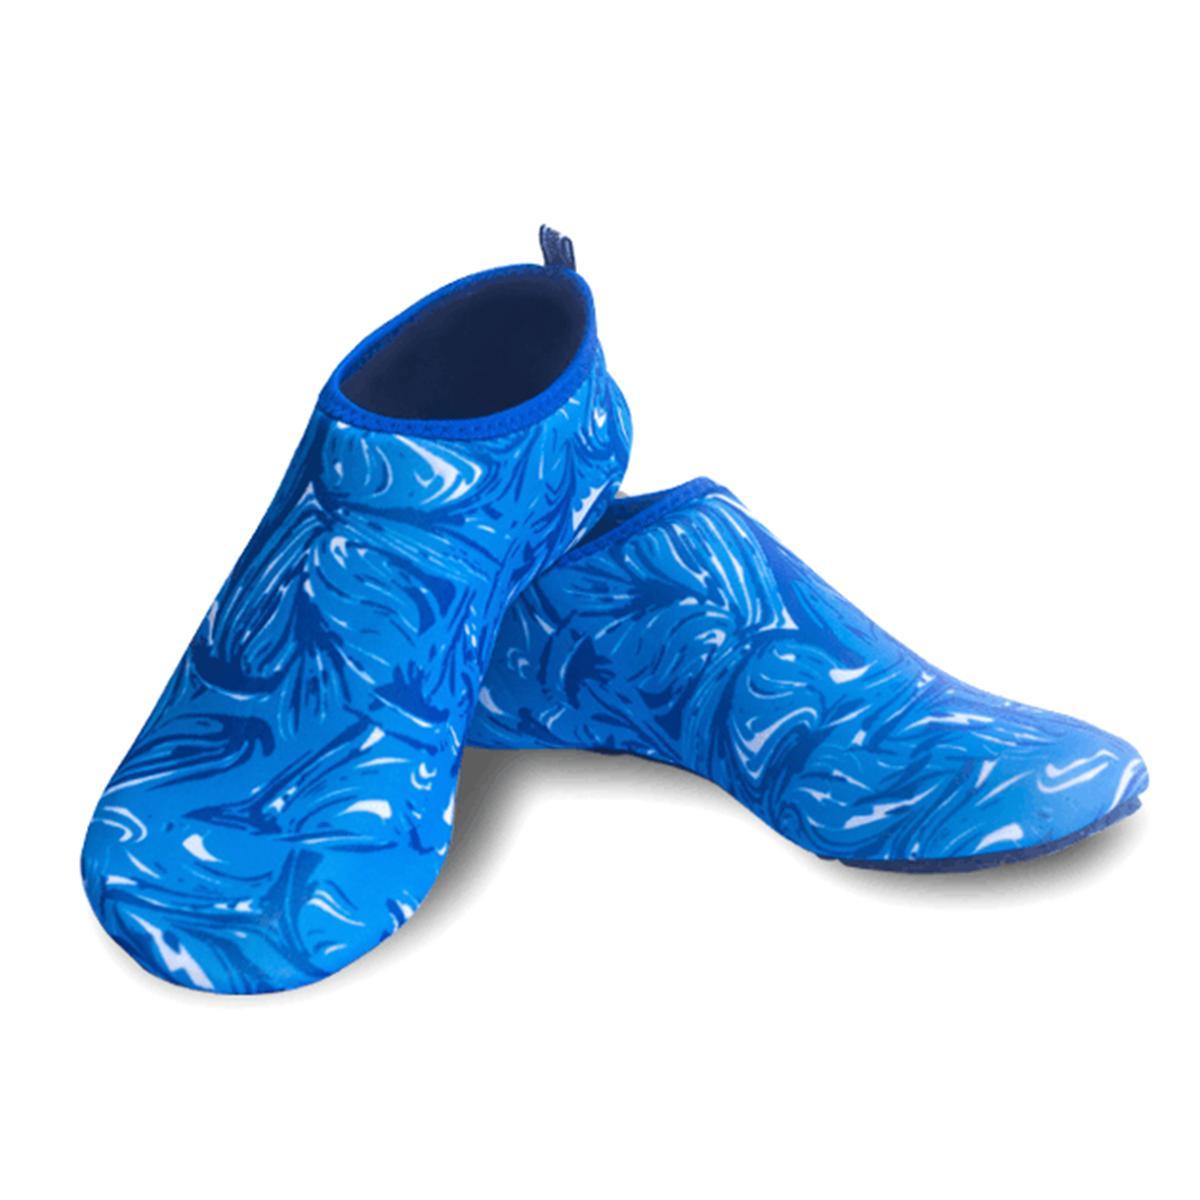 7851c0ff7f14 Non Slip Surf Water Beach Shoes Soft Mesh Socks Swim Diving Pool Yoga  Exercise Footwear COD